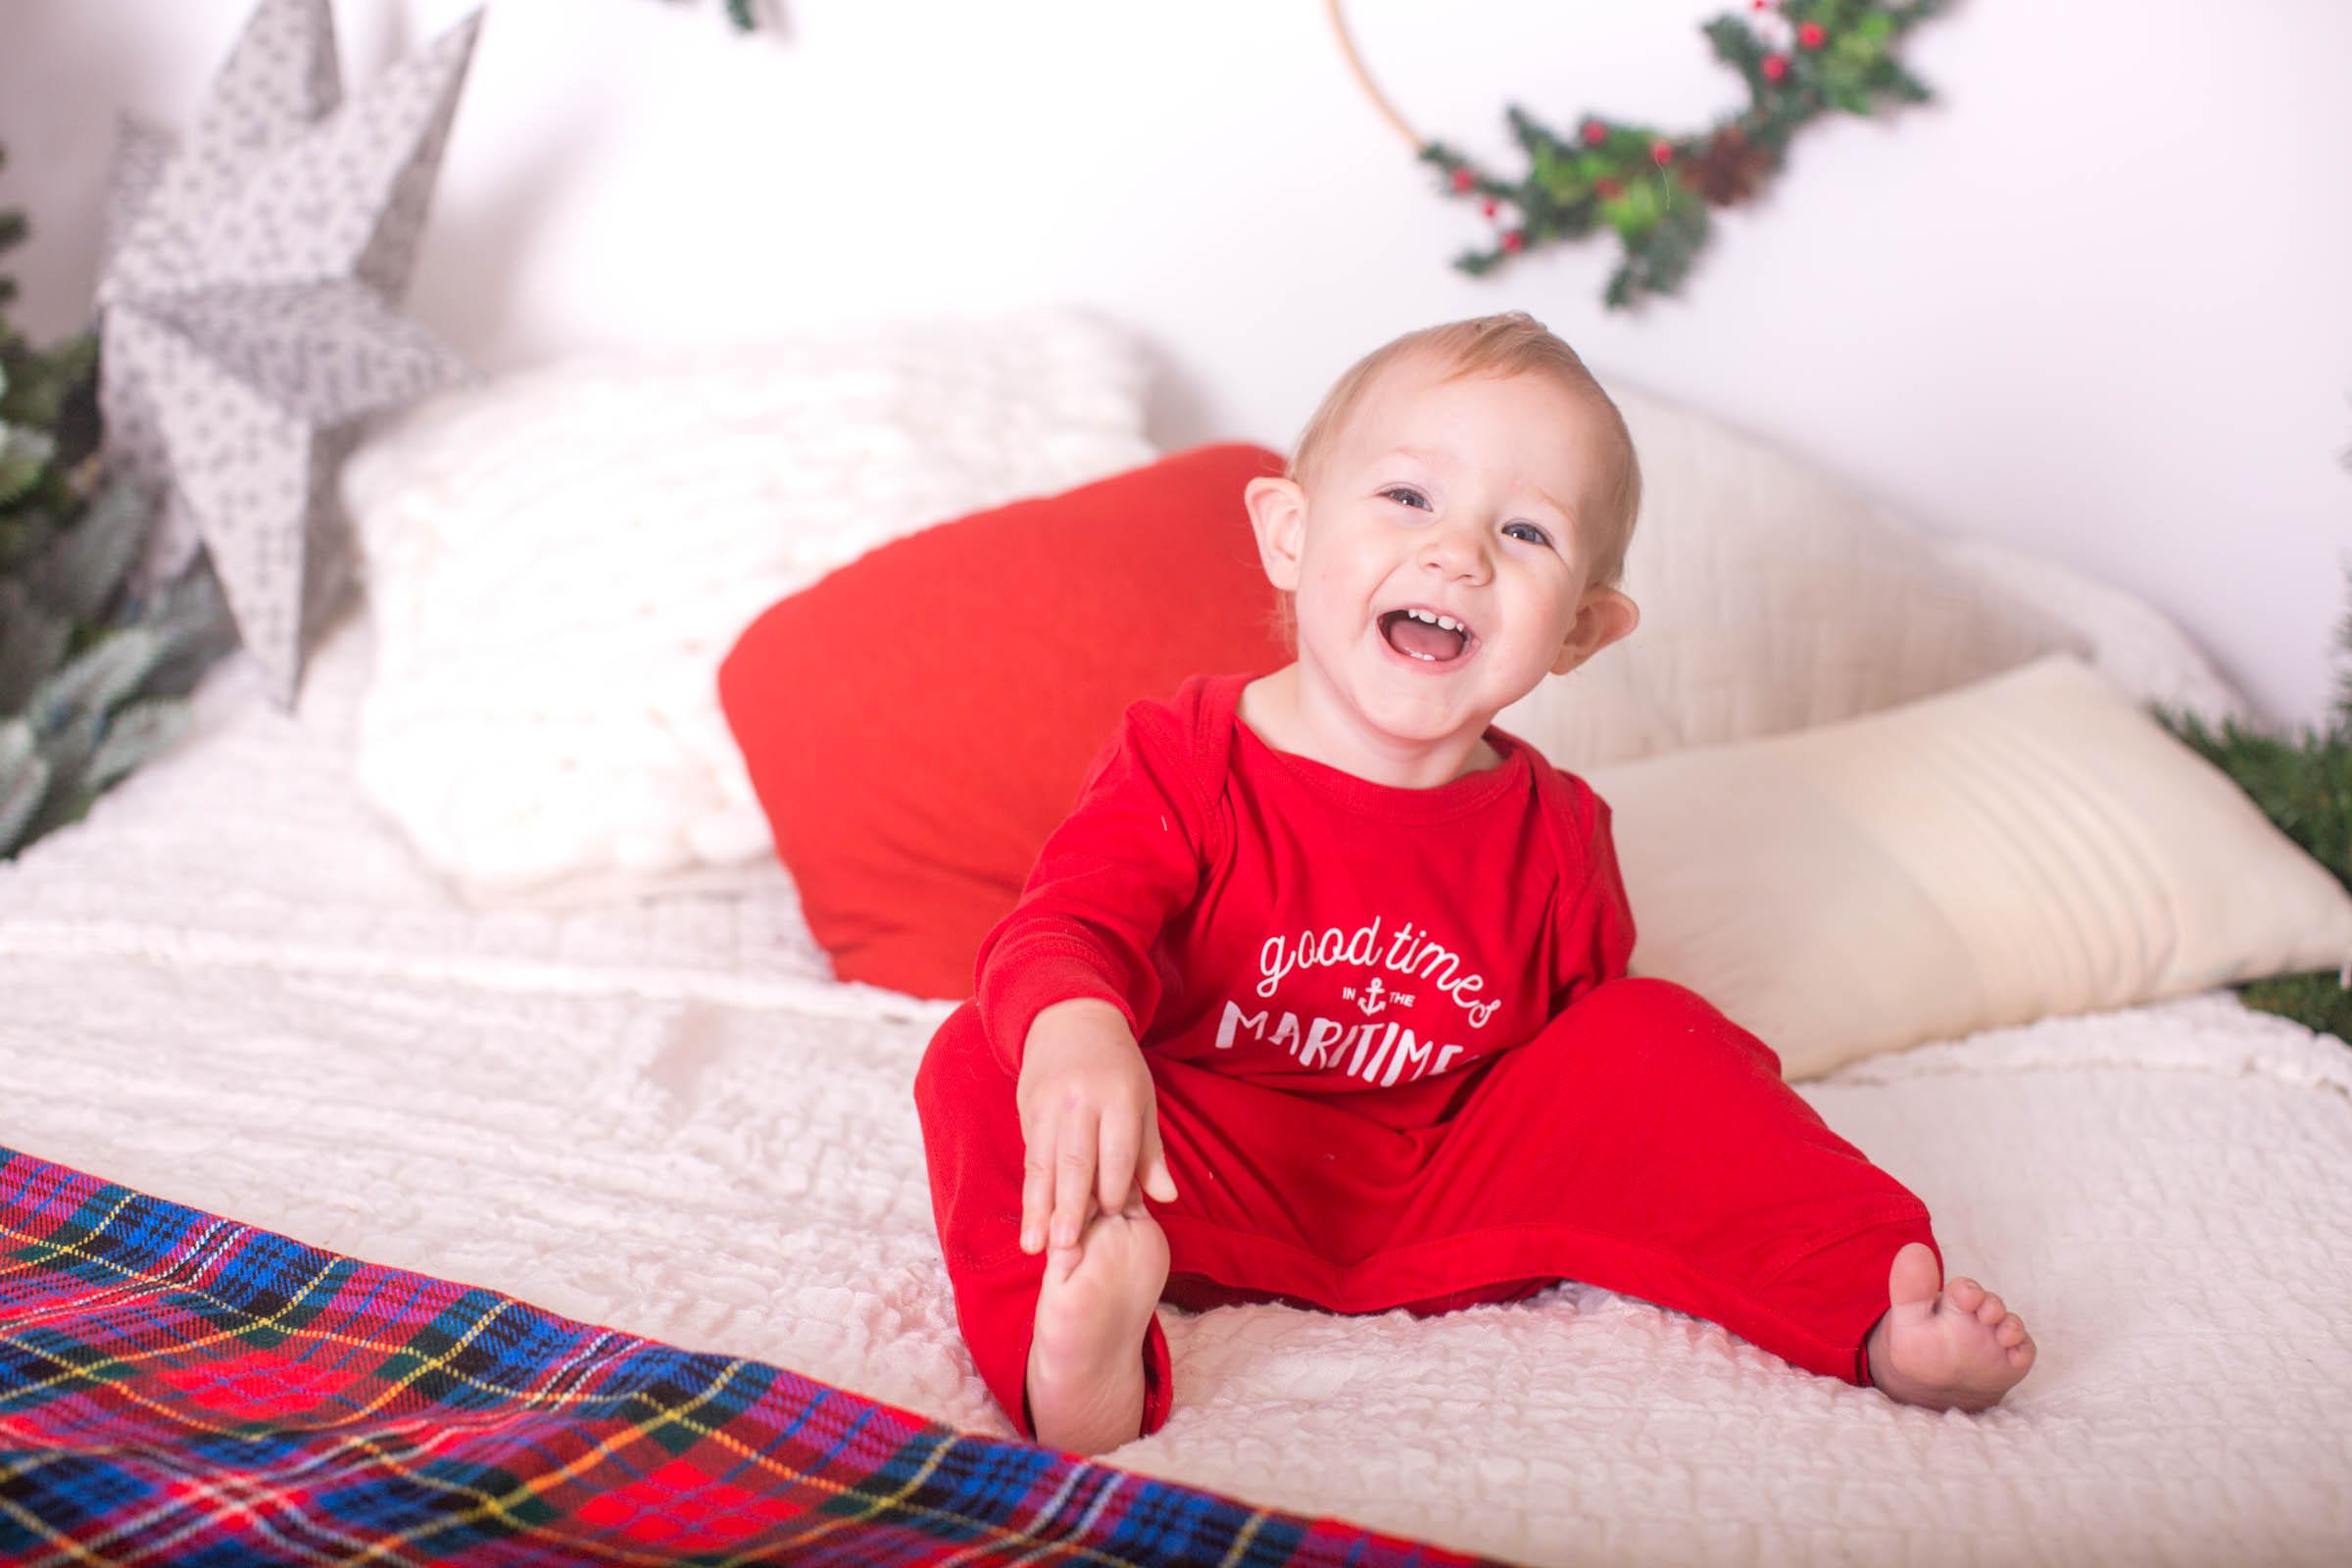 Image of boy laughing